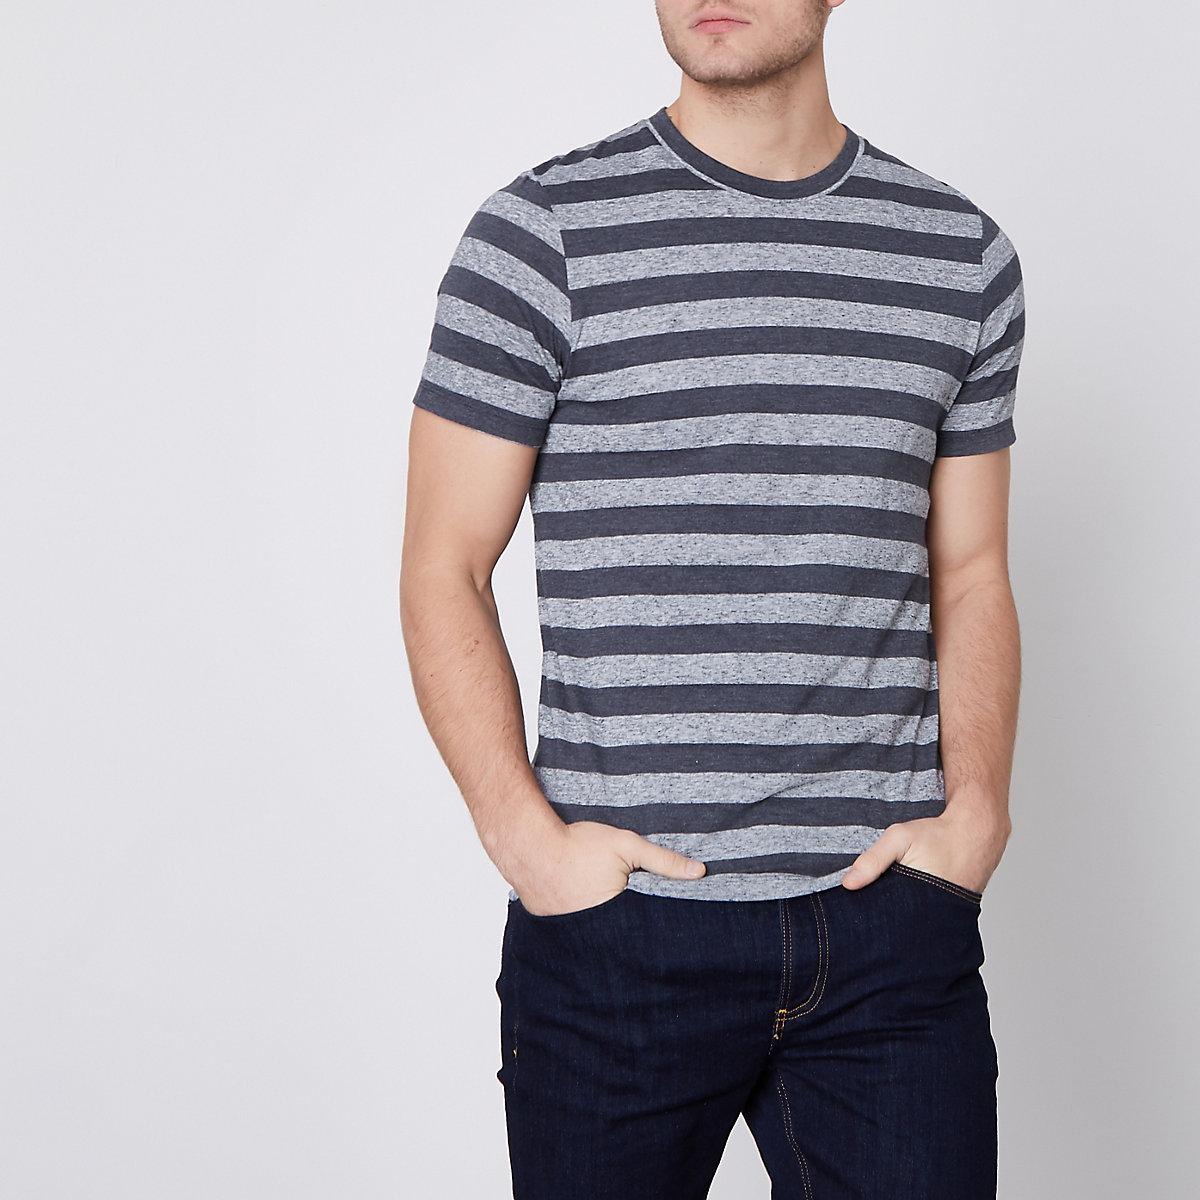 Jack & Jones Premium navy stripe T-shirt